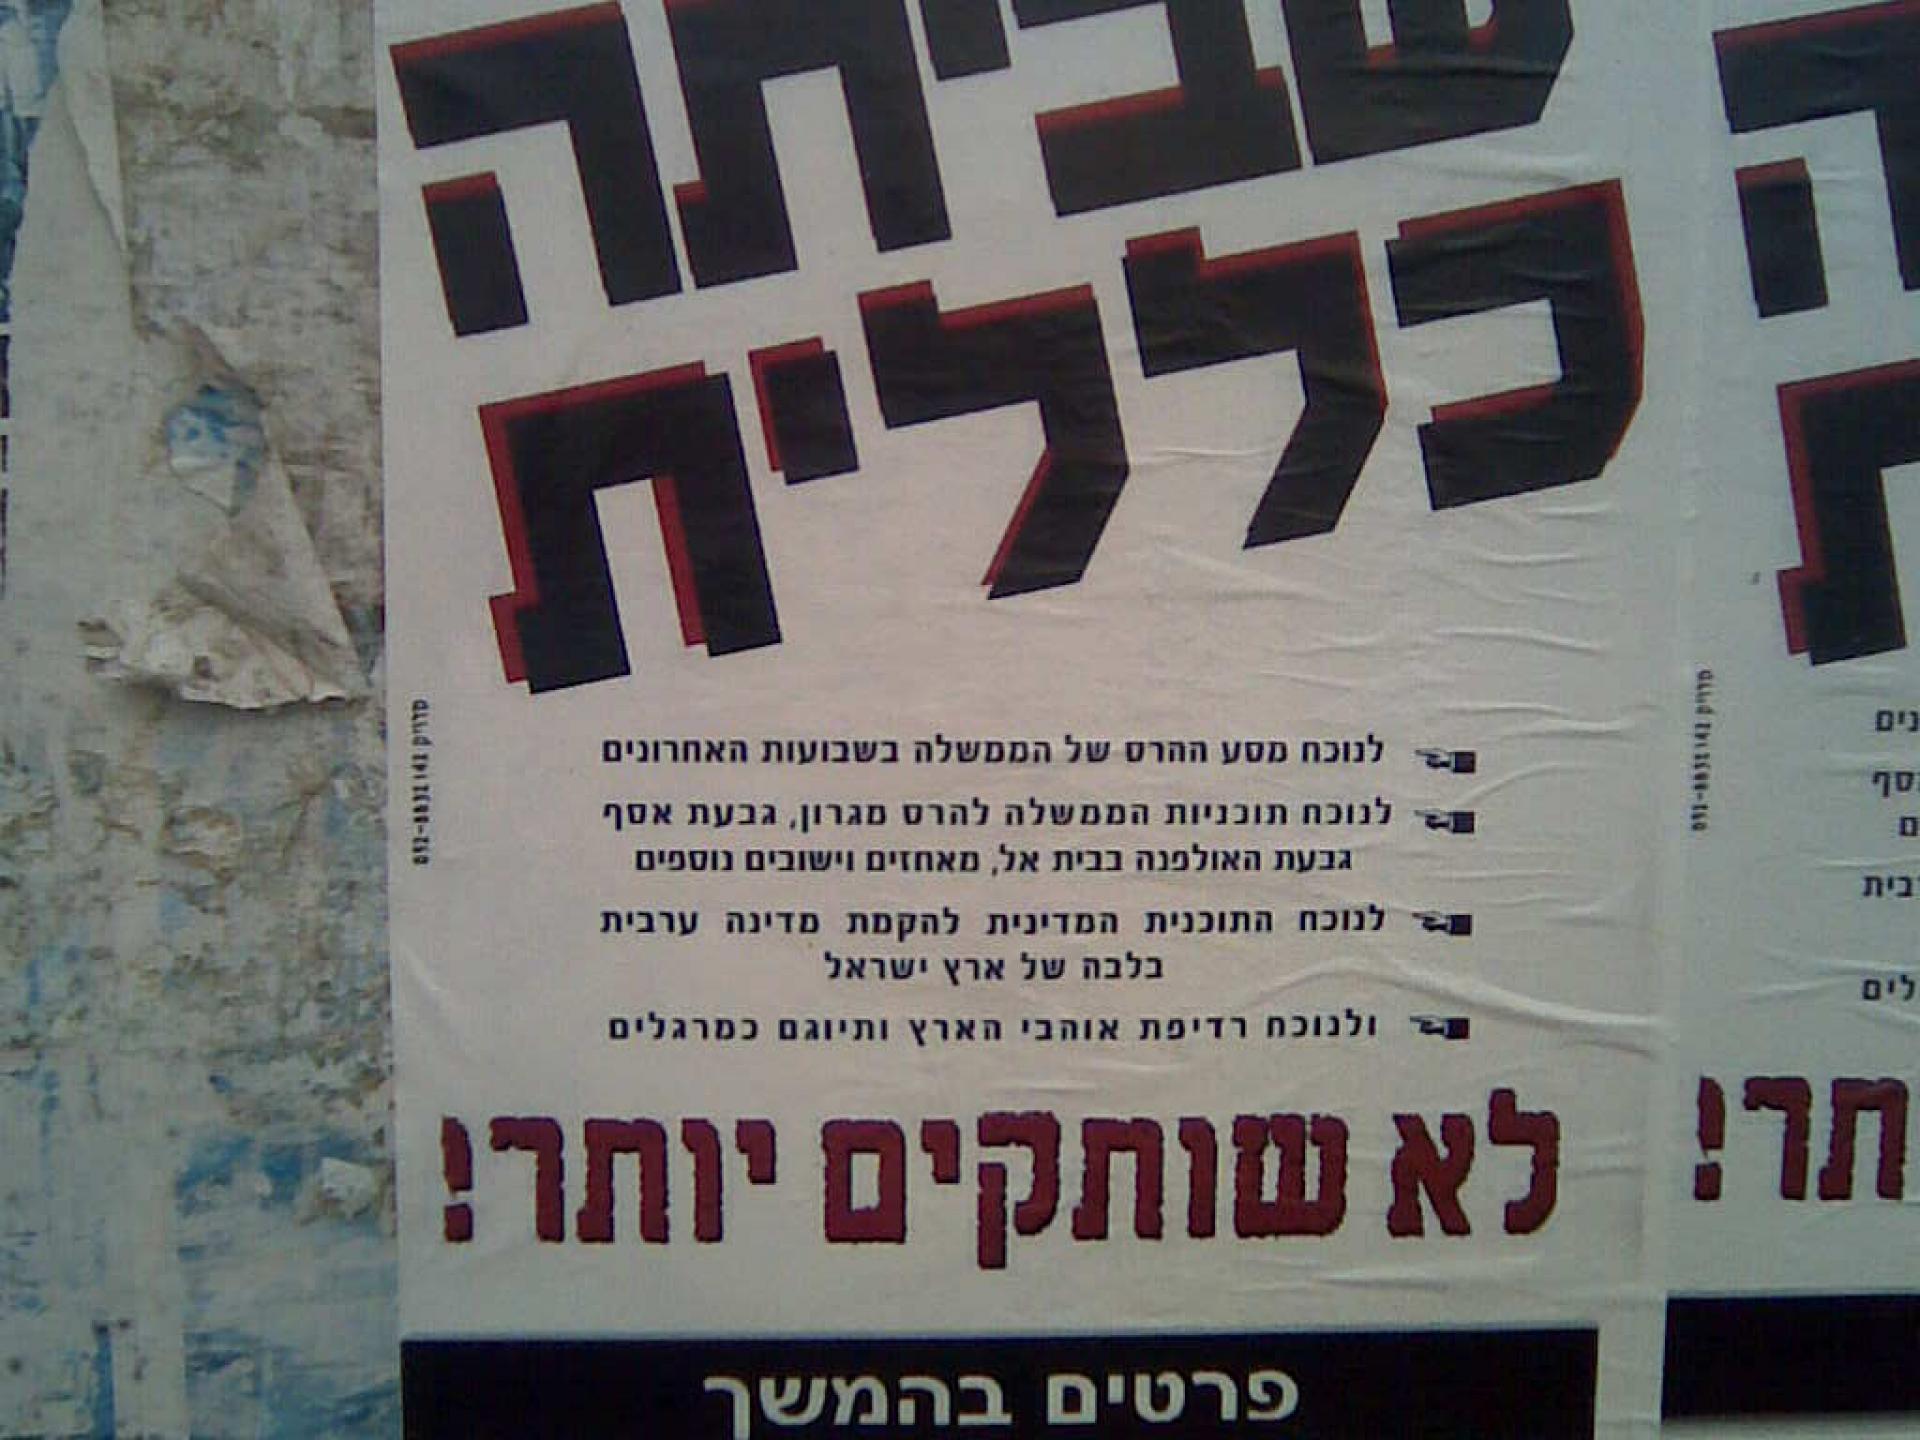 Hebron 12.02.12